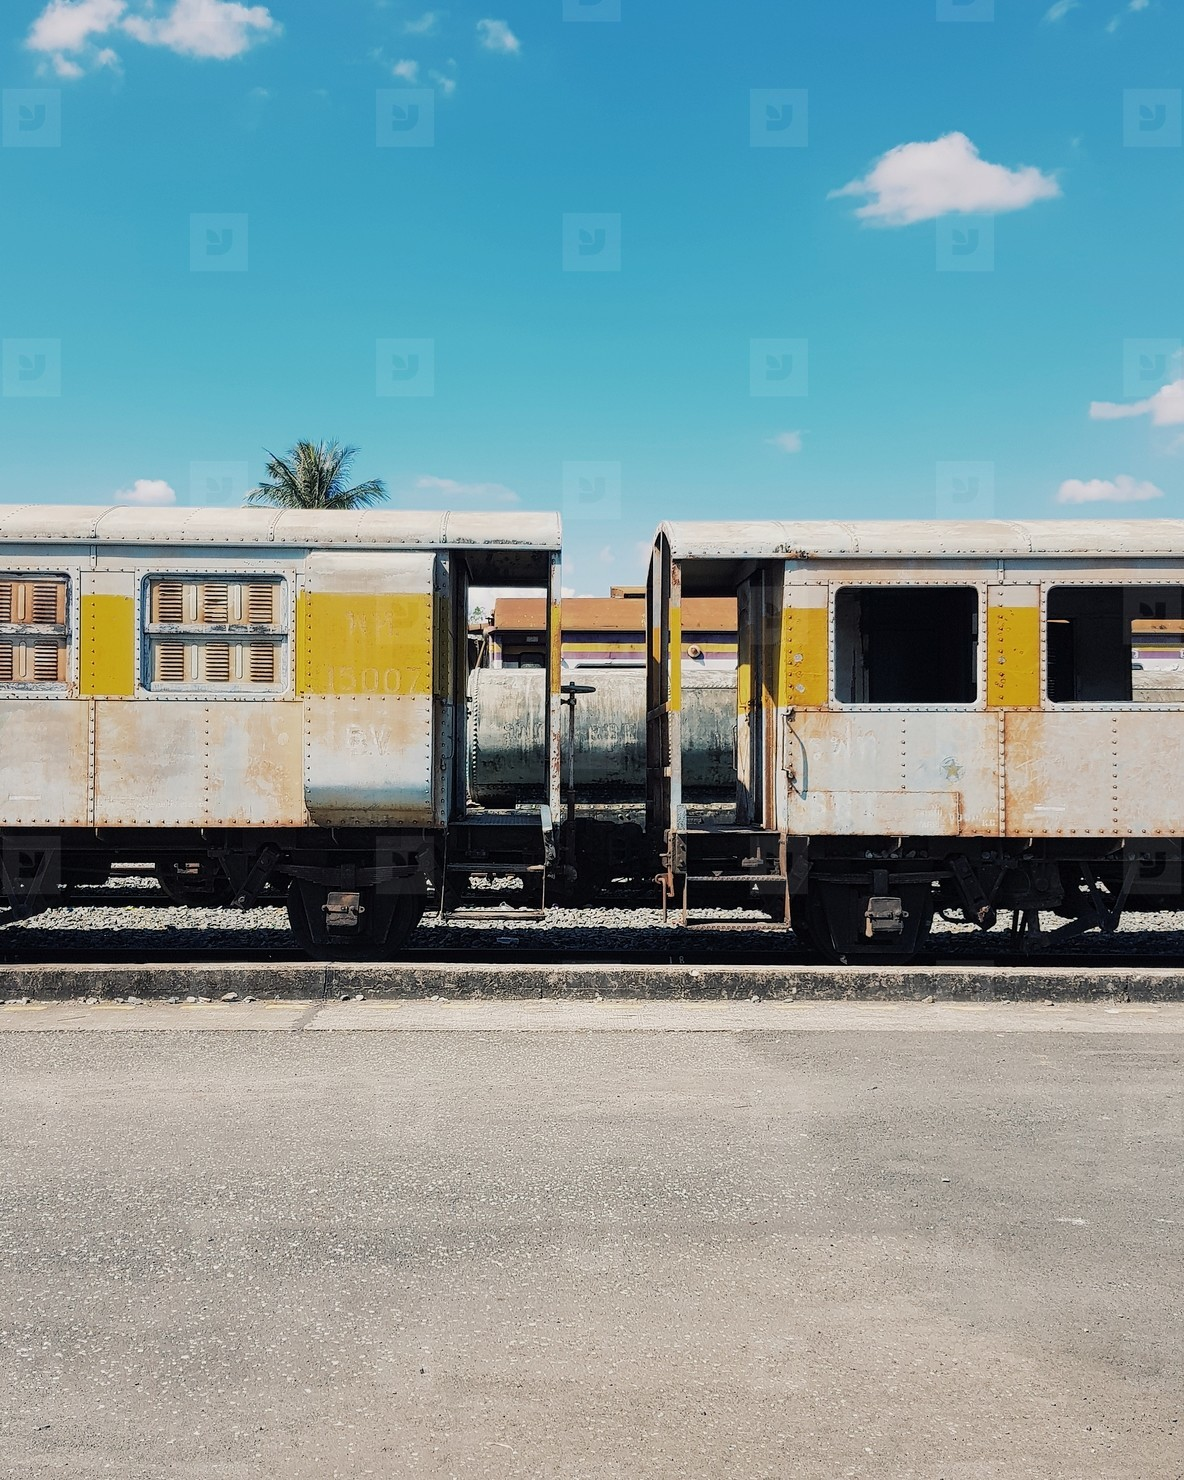 Train bogie with blue sky